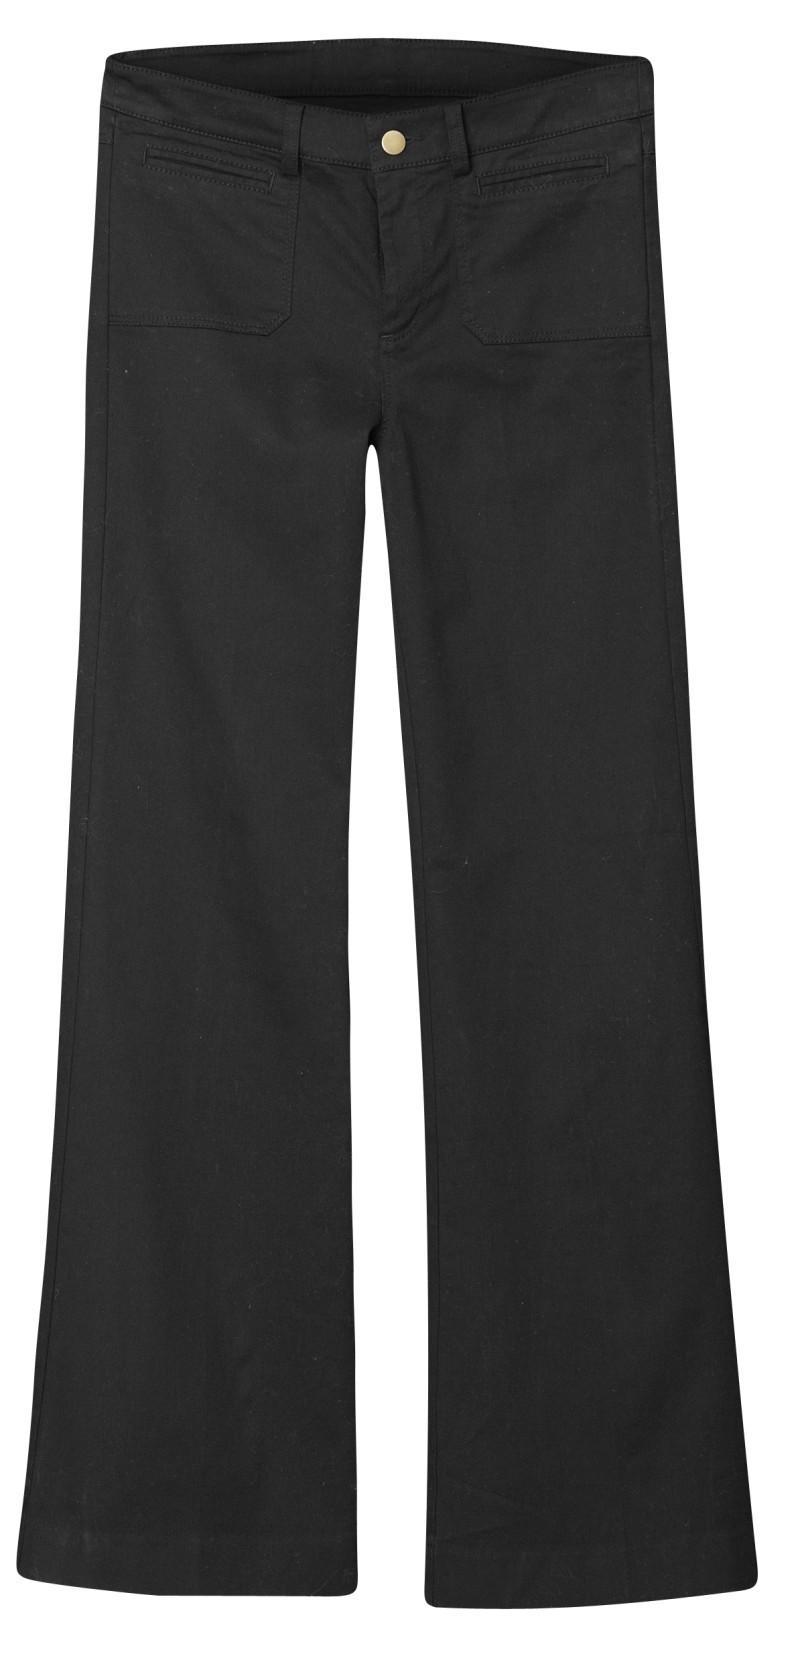 czarne spodnie H&M - kolekcja wiosenno/letnia